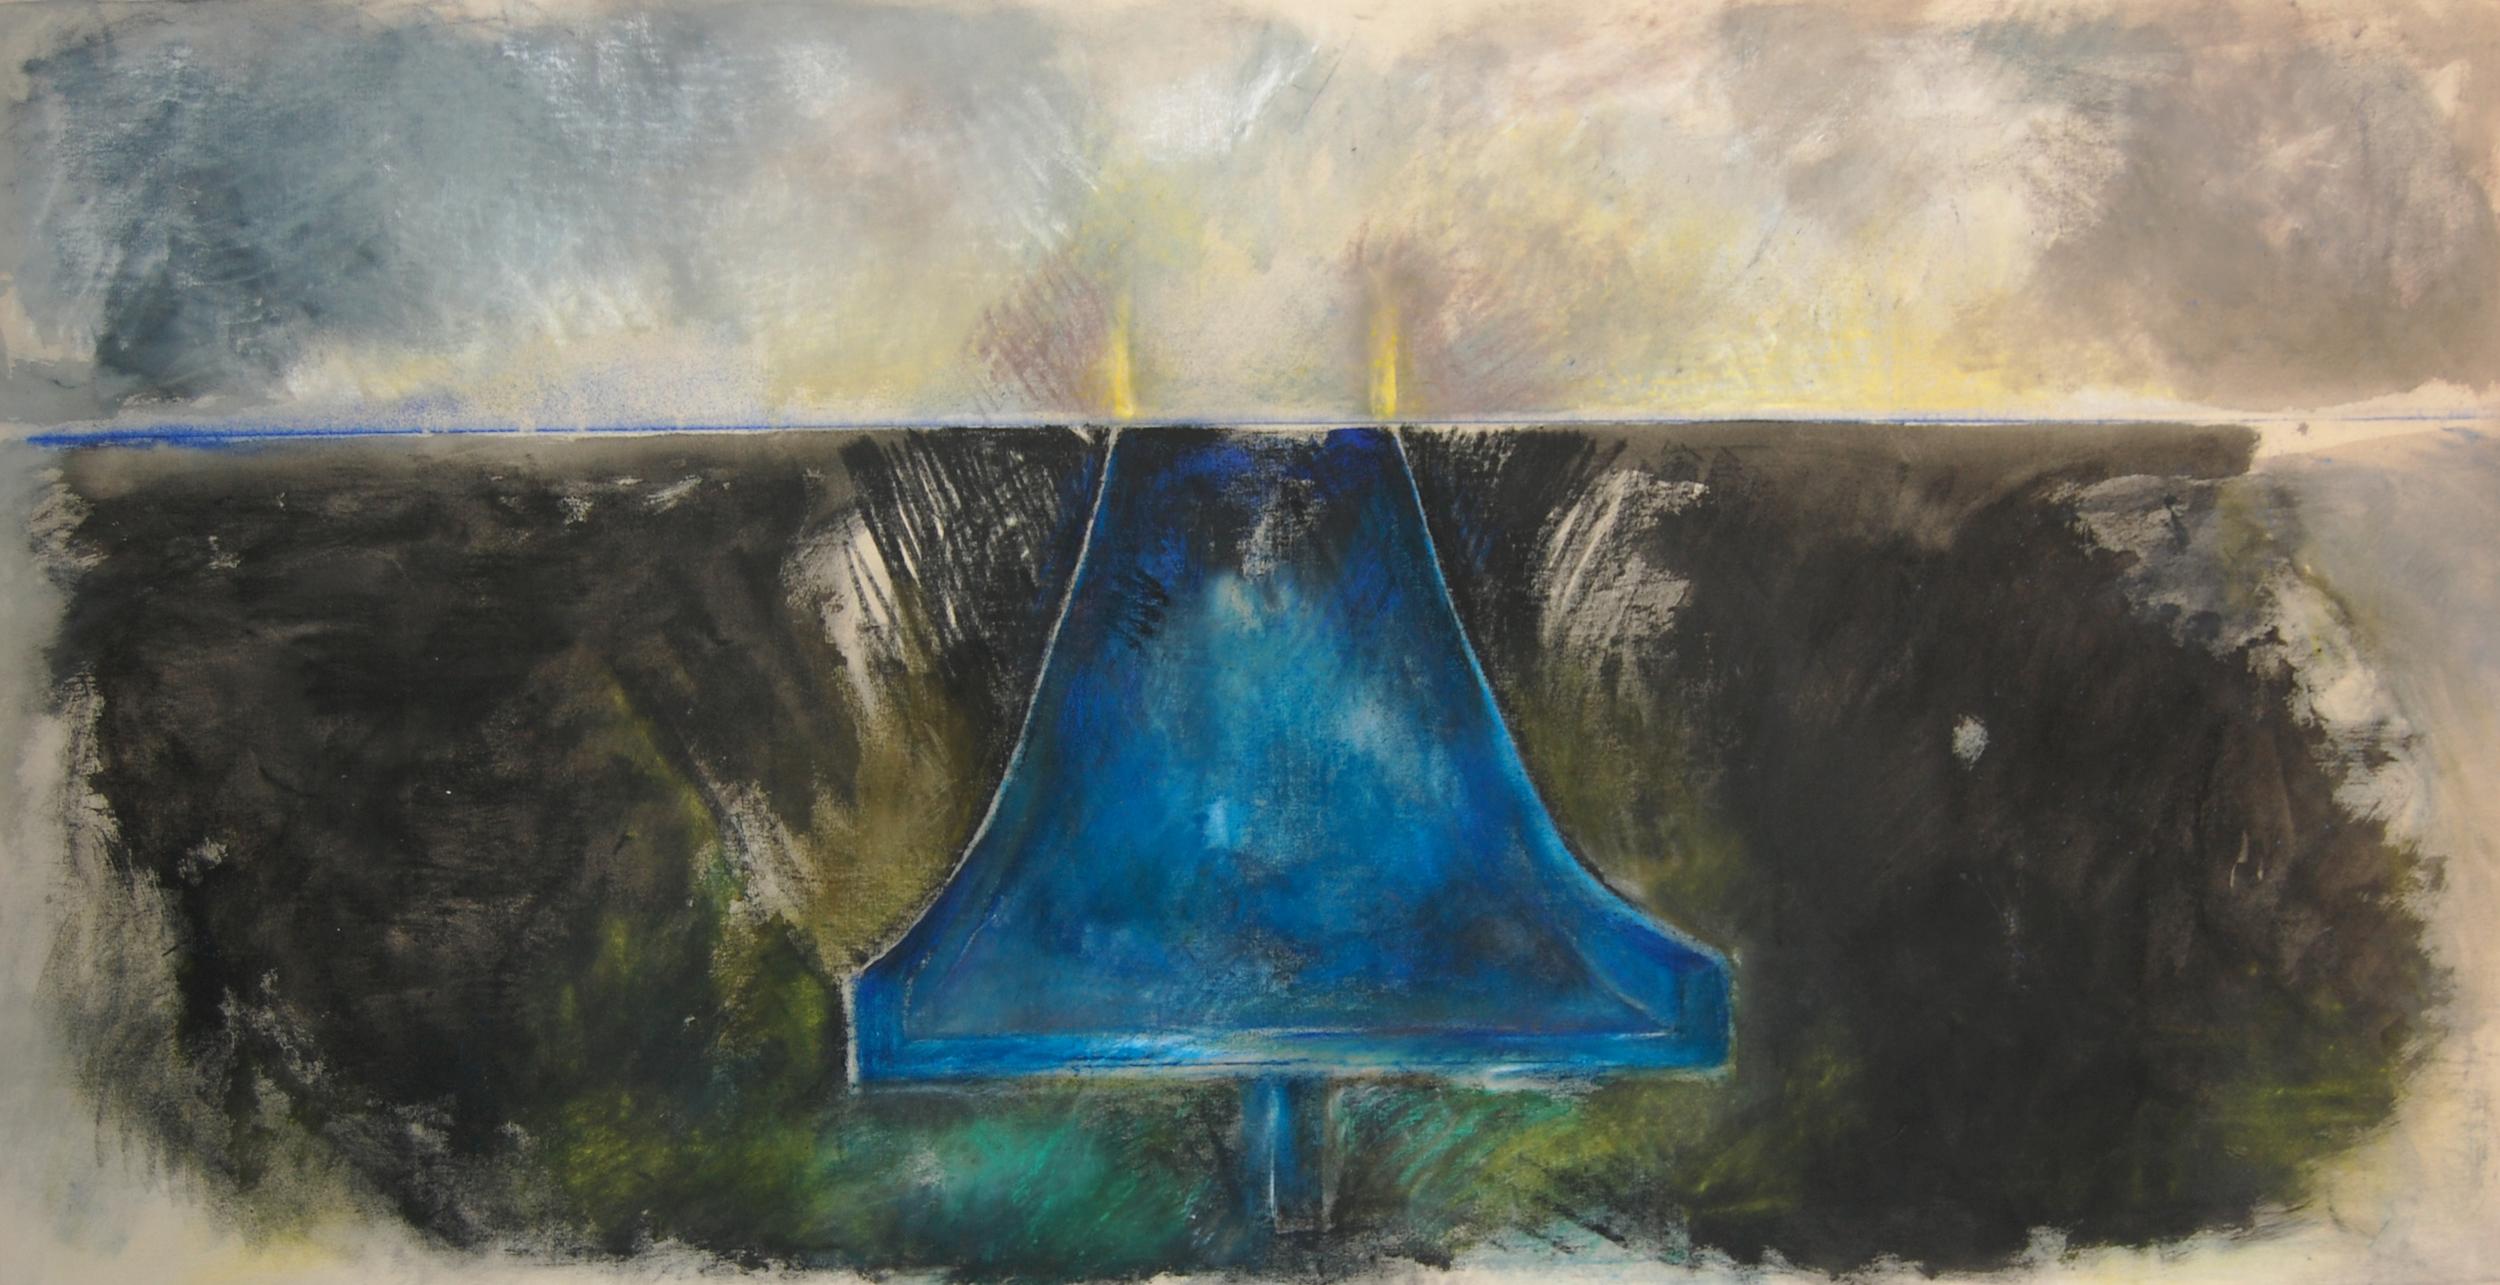 Deep Blue Slide, 4'x8', Pastel on canvas